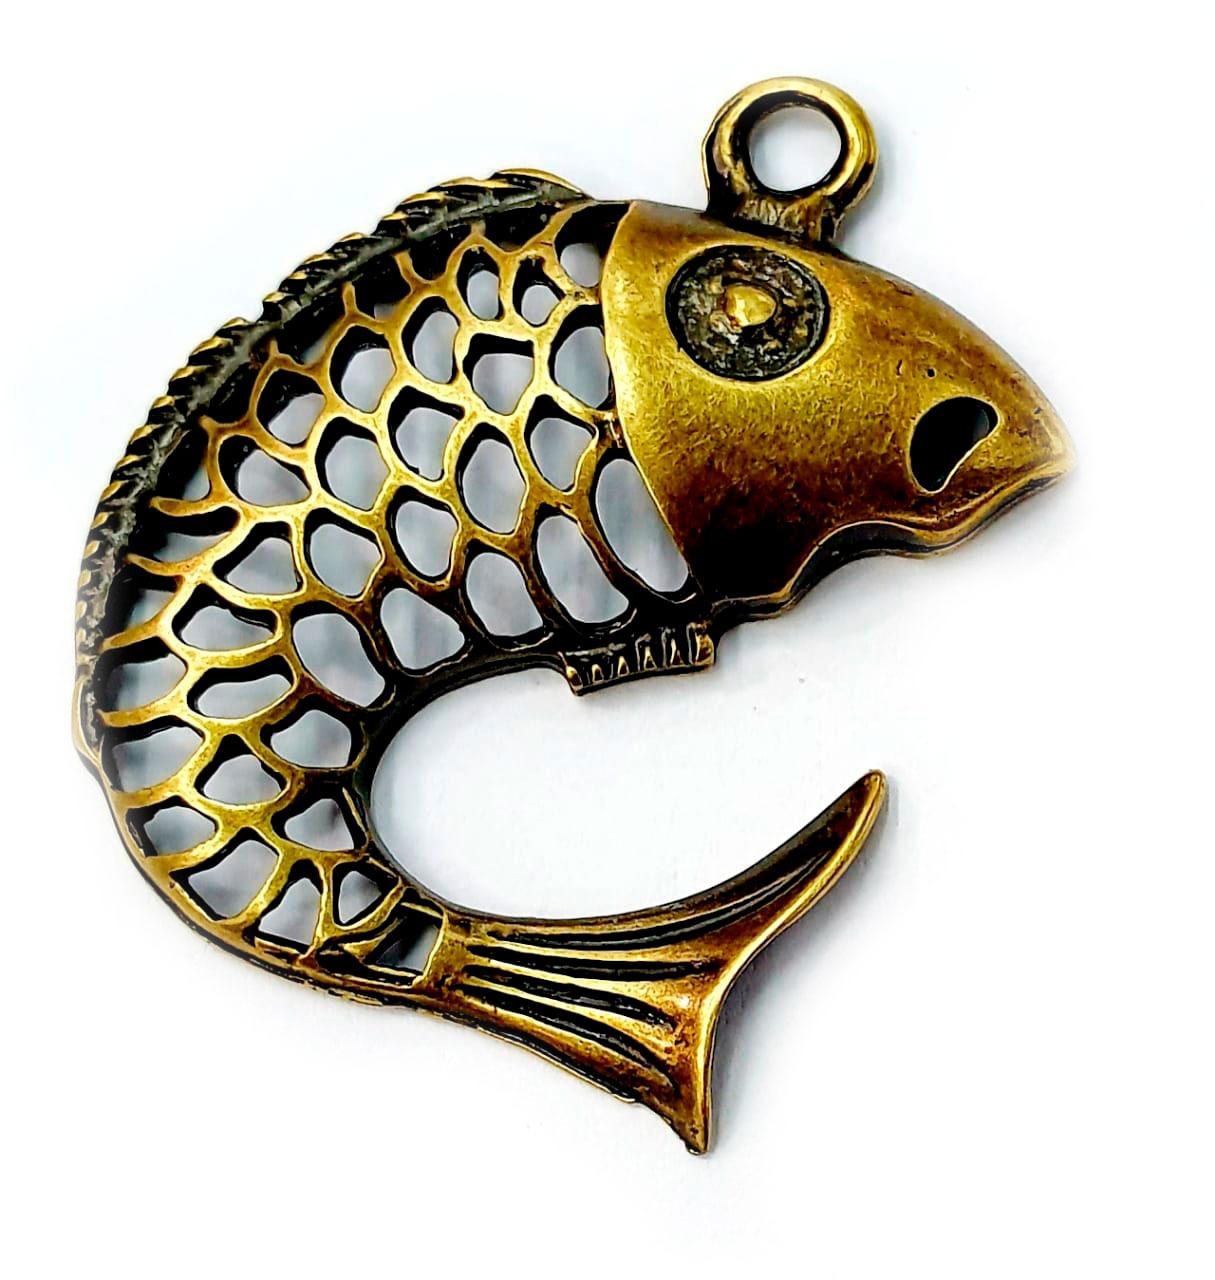 Pingente de Peixe Carpa